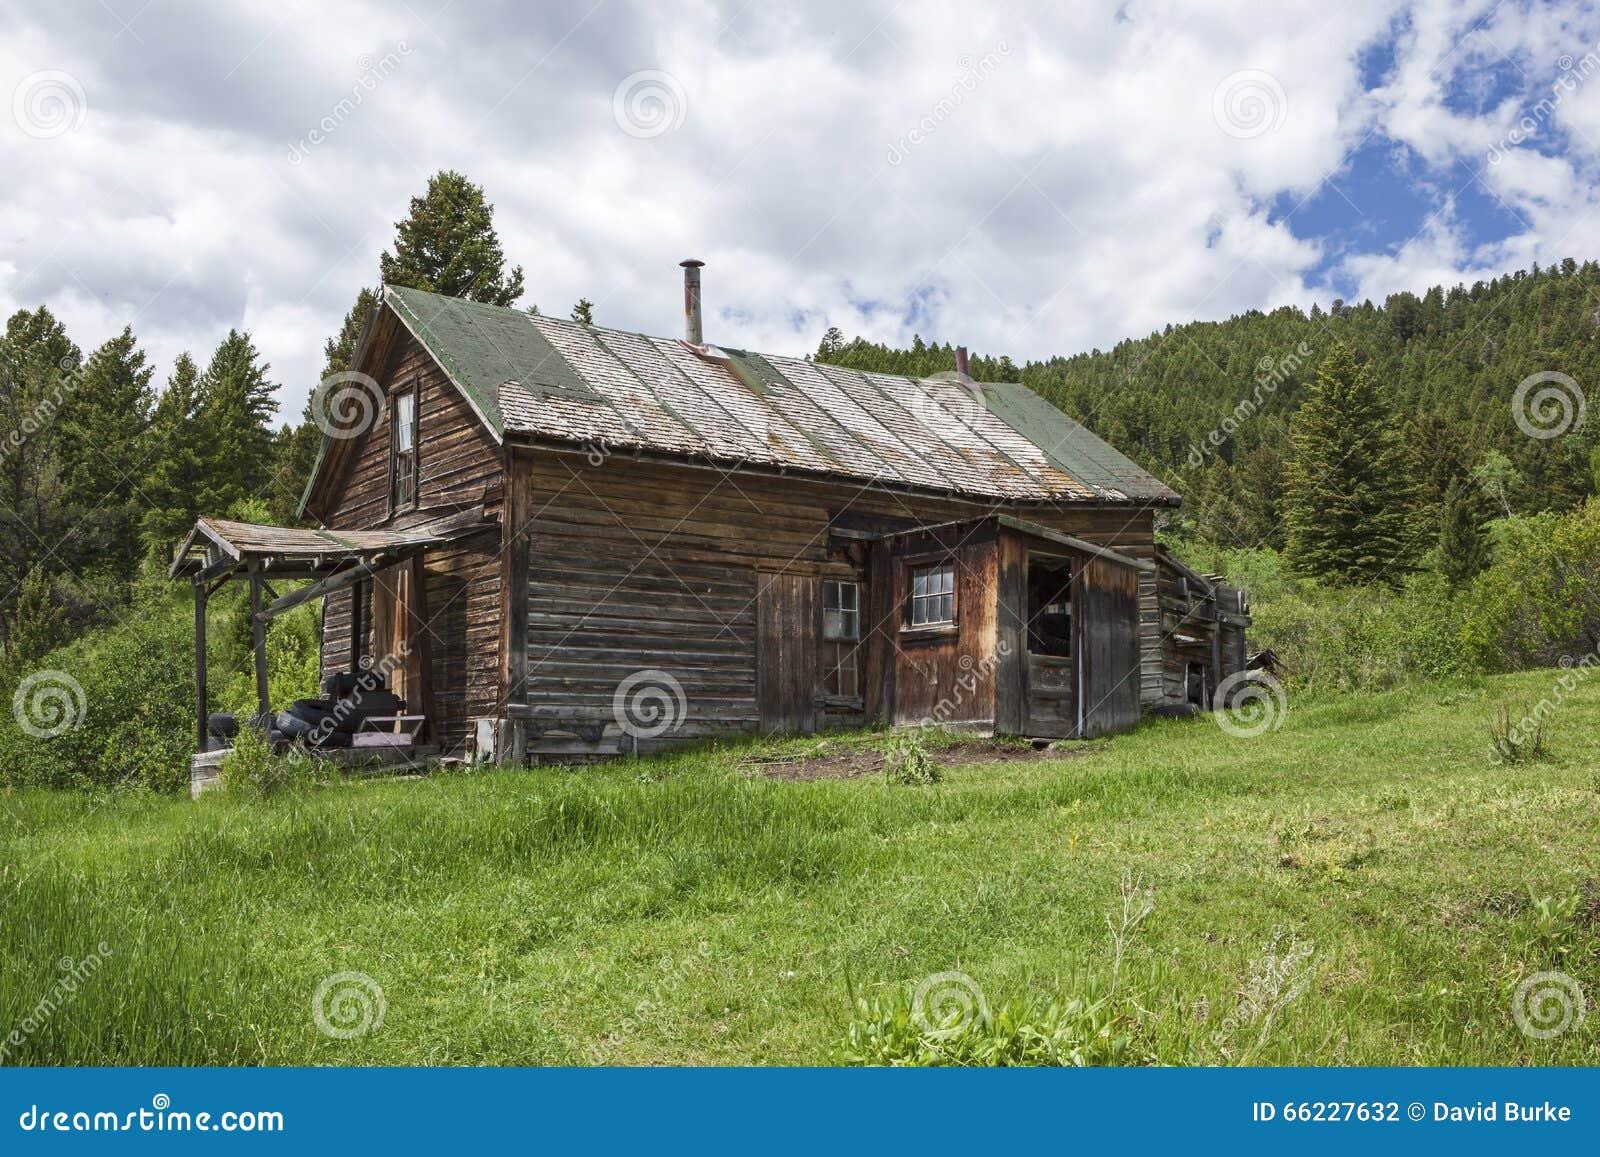 Old Weathered Farmhouse Mountains Grass Stock Photo Image 66227632